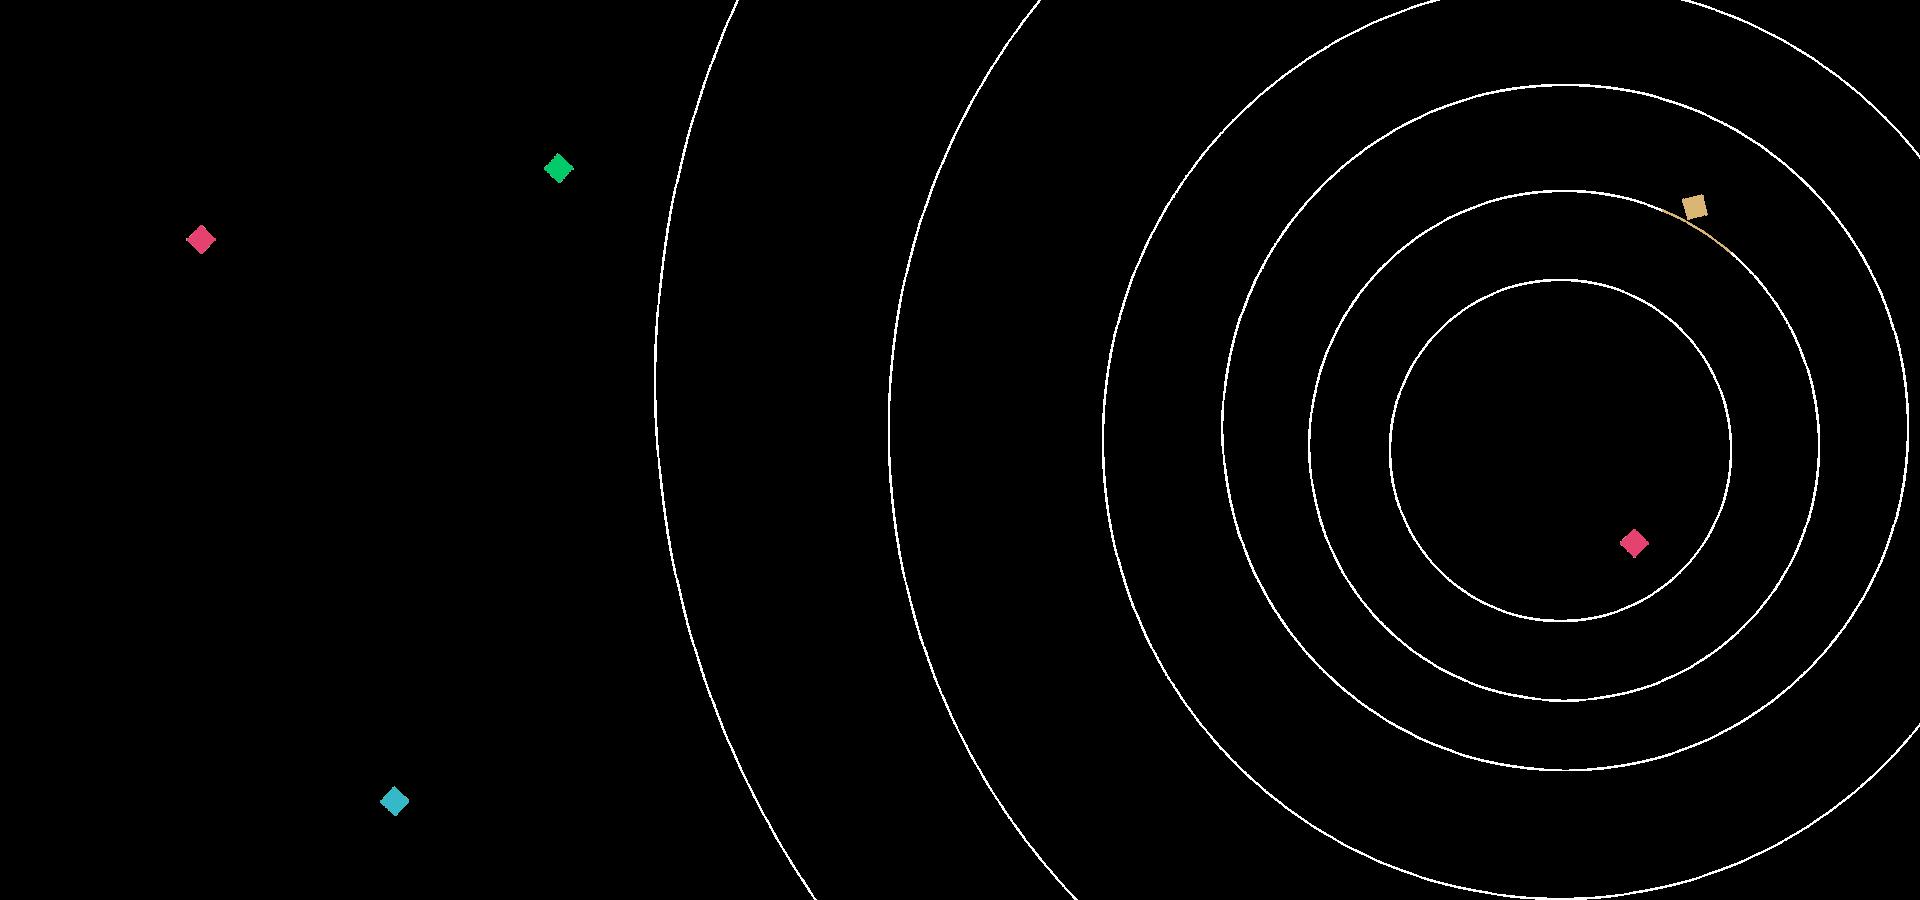 pattern_background4